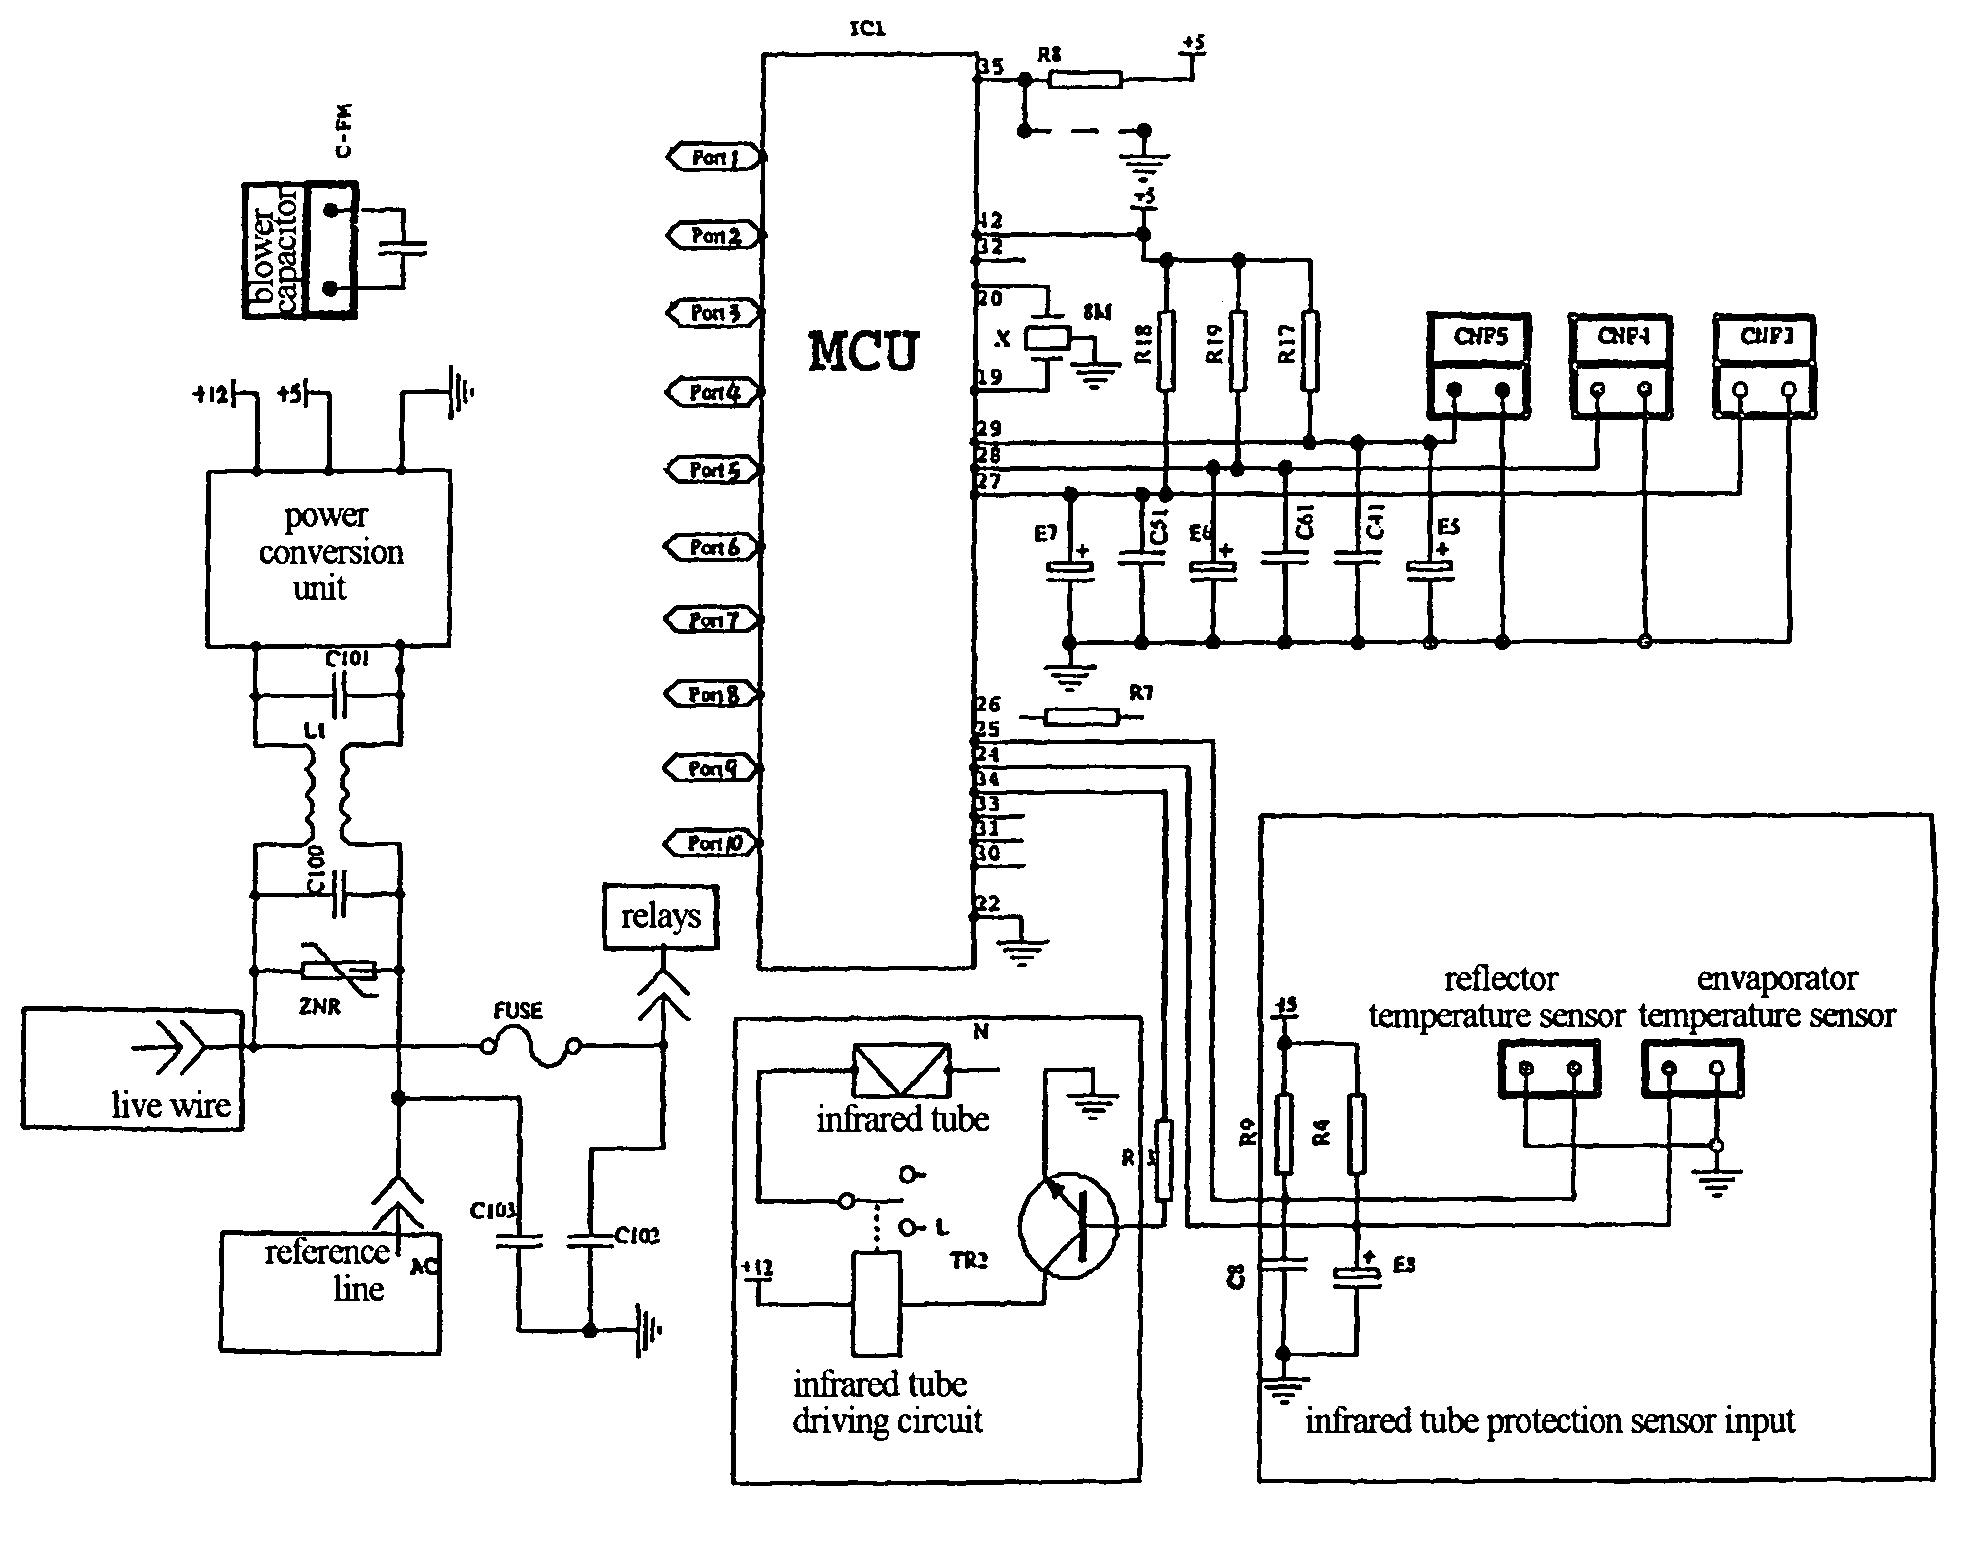 galanz air conditioner wiring diagram